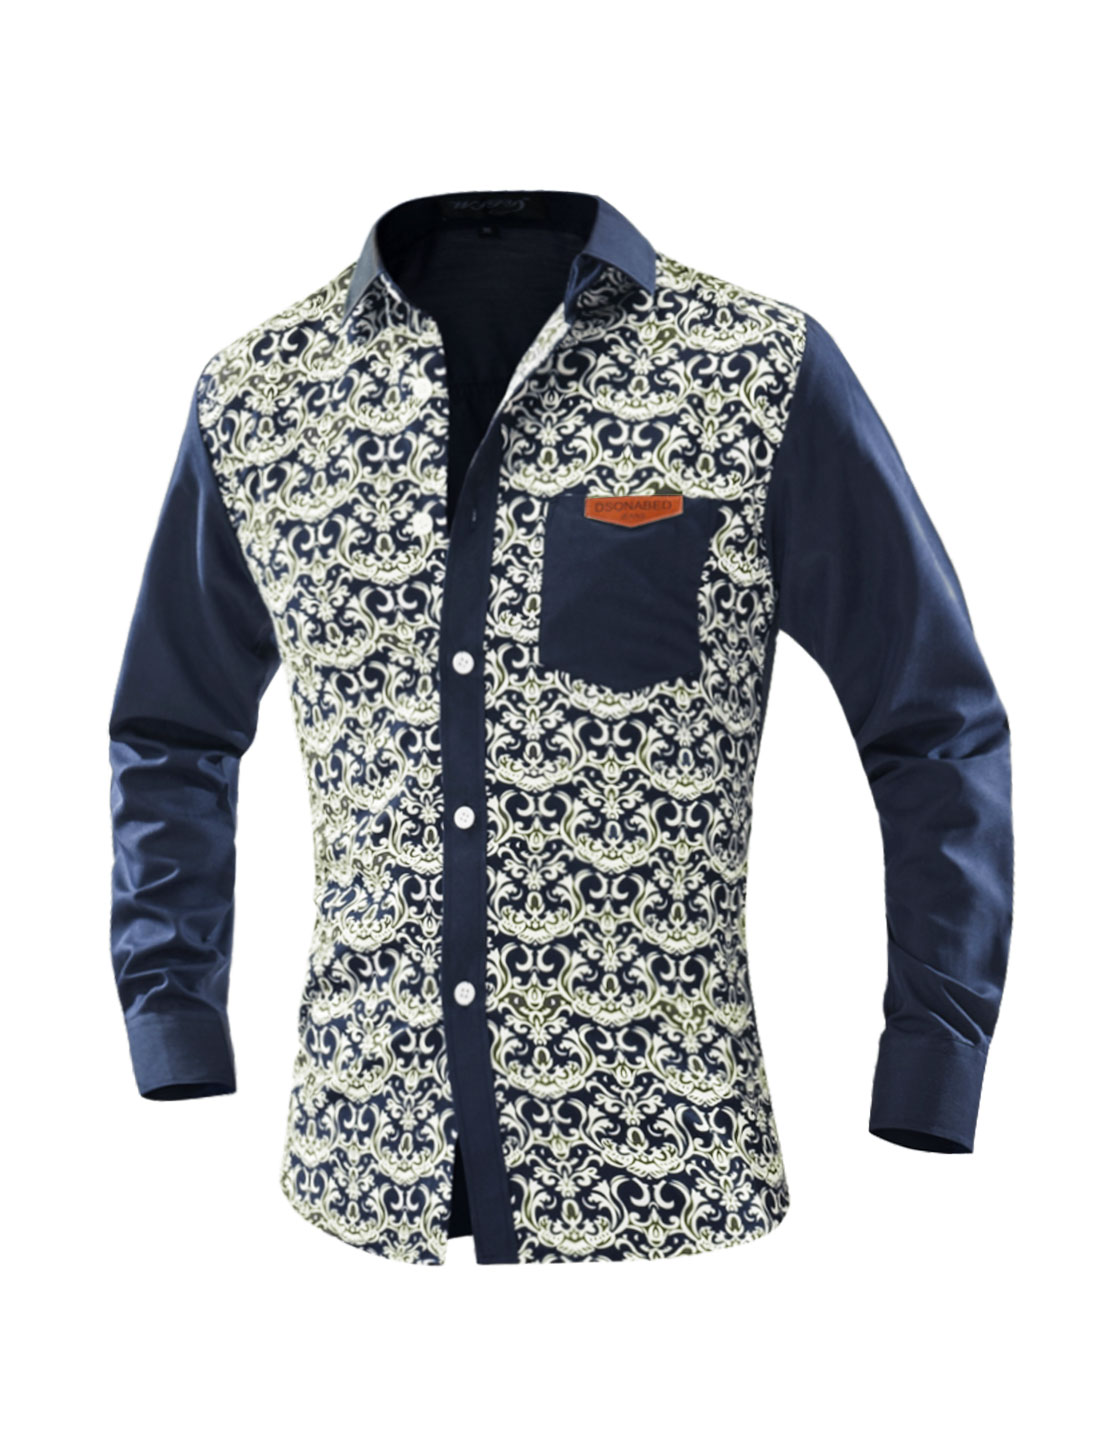 Men Collared Long Sleeves Novelty Slim Fit Shirt Beige M